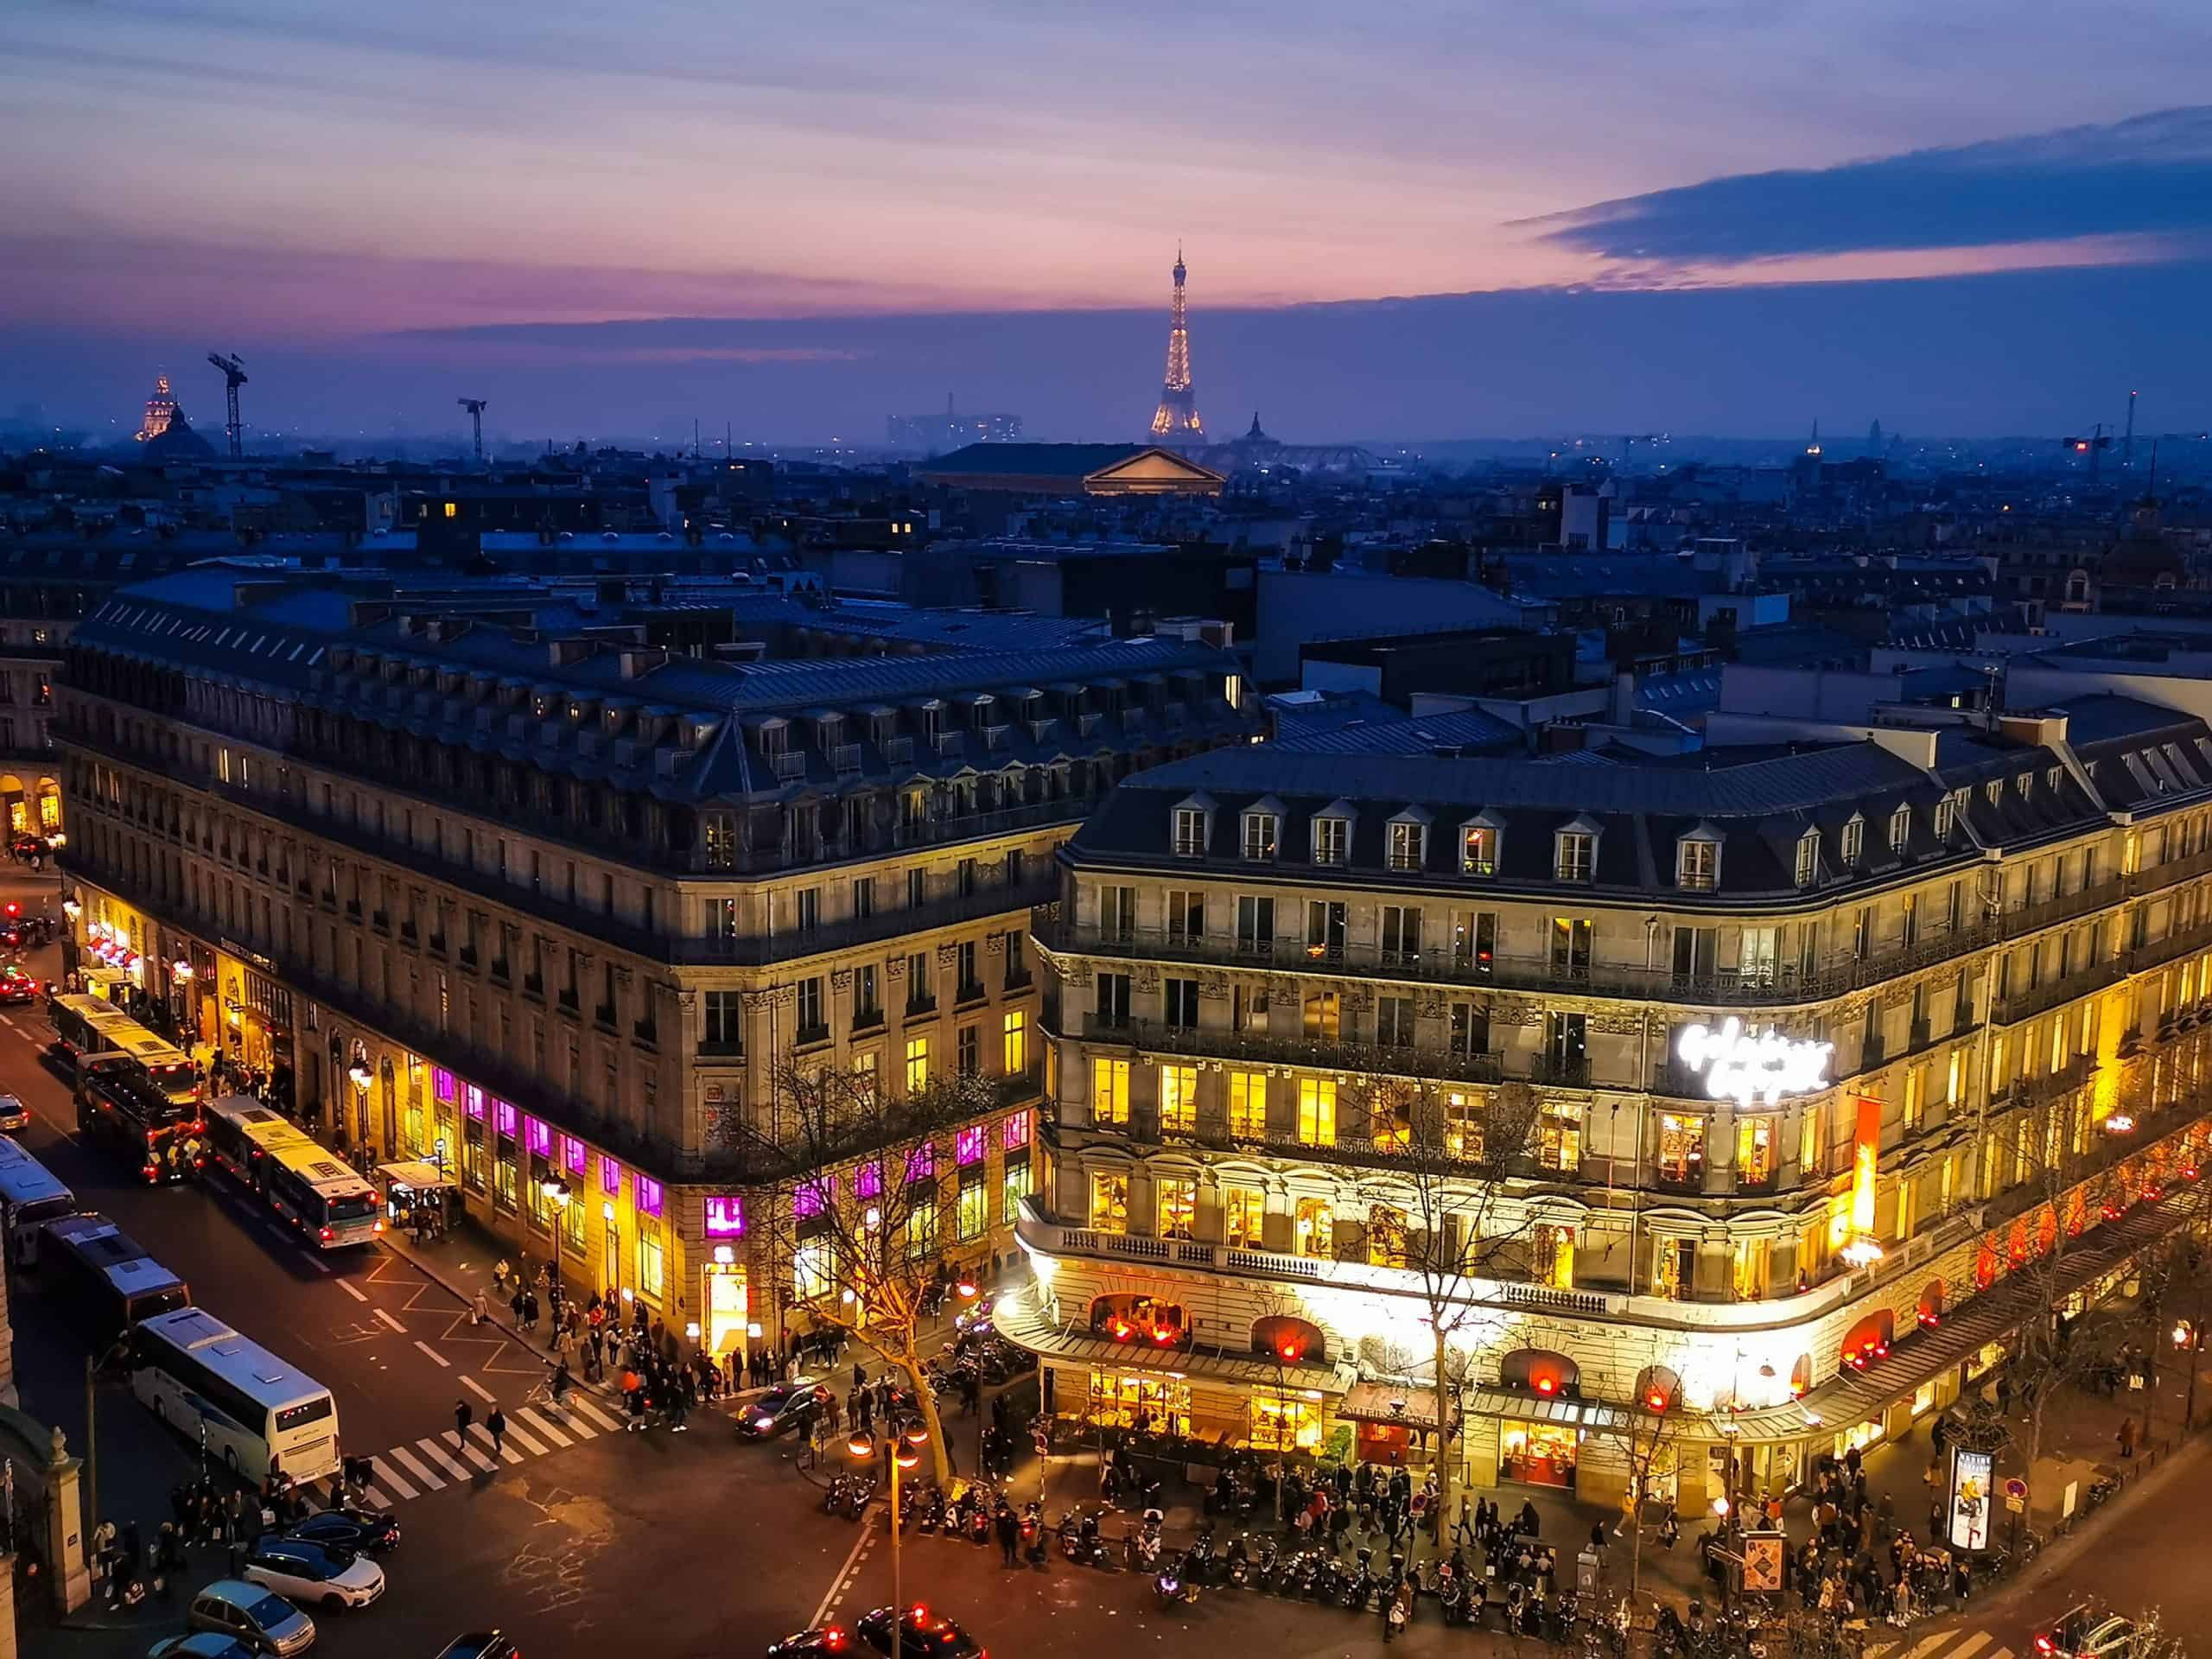 galeries lafayette rooftop best view in paris